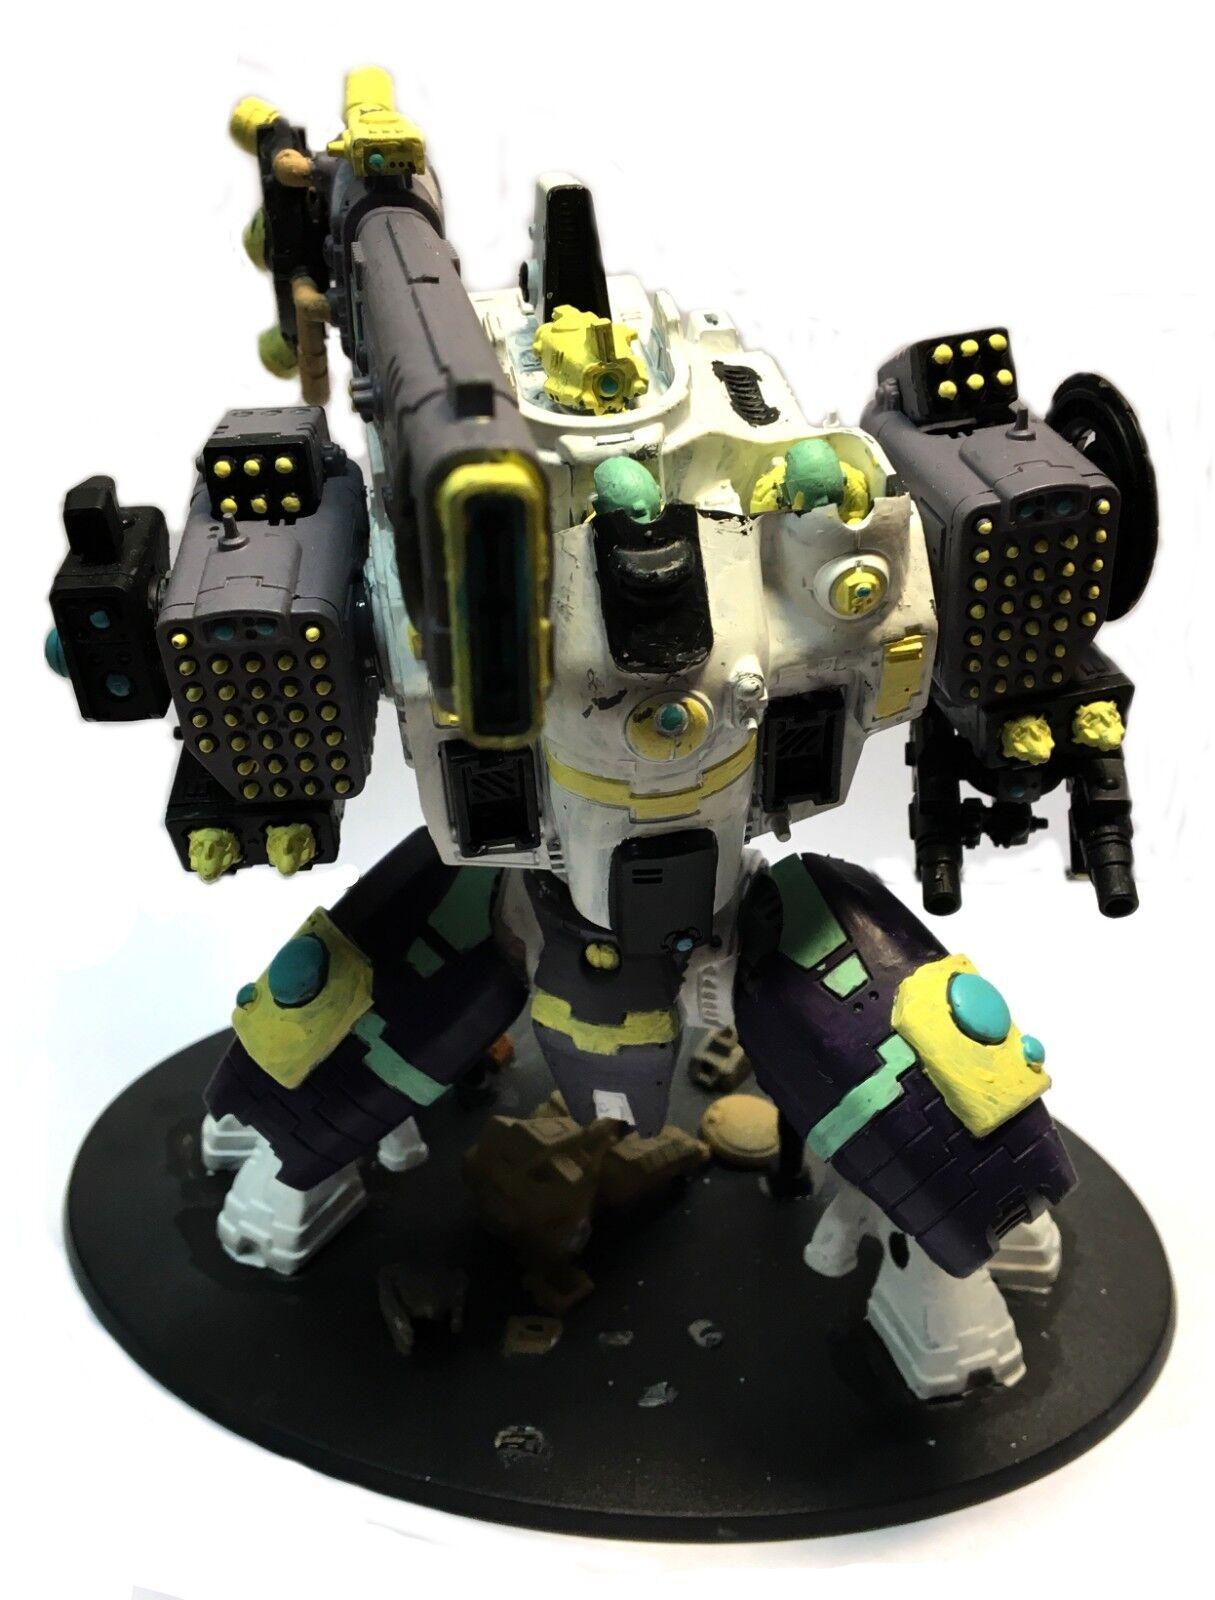 Warhammer 40.00 - Tau KV128 Stormsurge - 1 3 32in scale